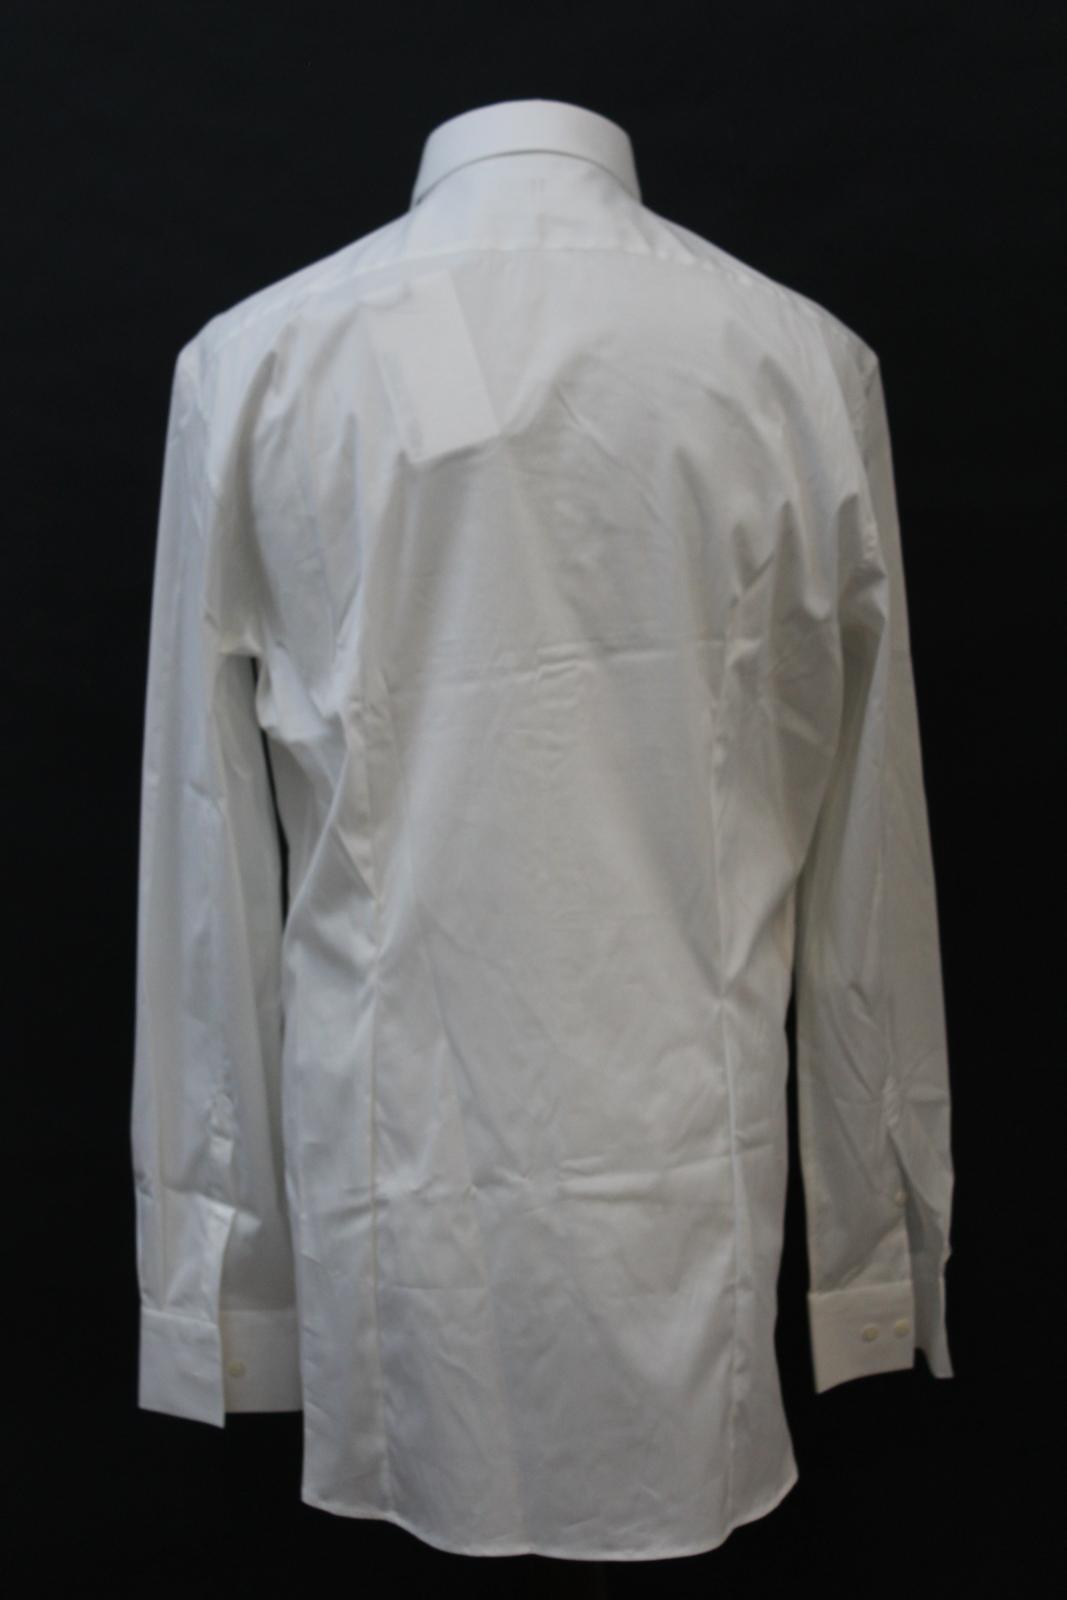 Neil-Barrett-Hombre-Blanco-De-Algodon-Manga-Larga-Camiseta-Formal-Cuello-17-034-43cm-BNWT miniatura 5